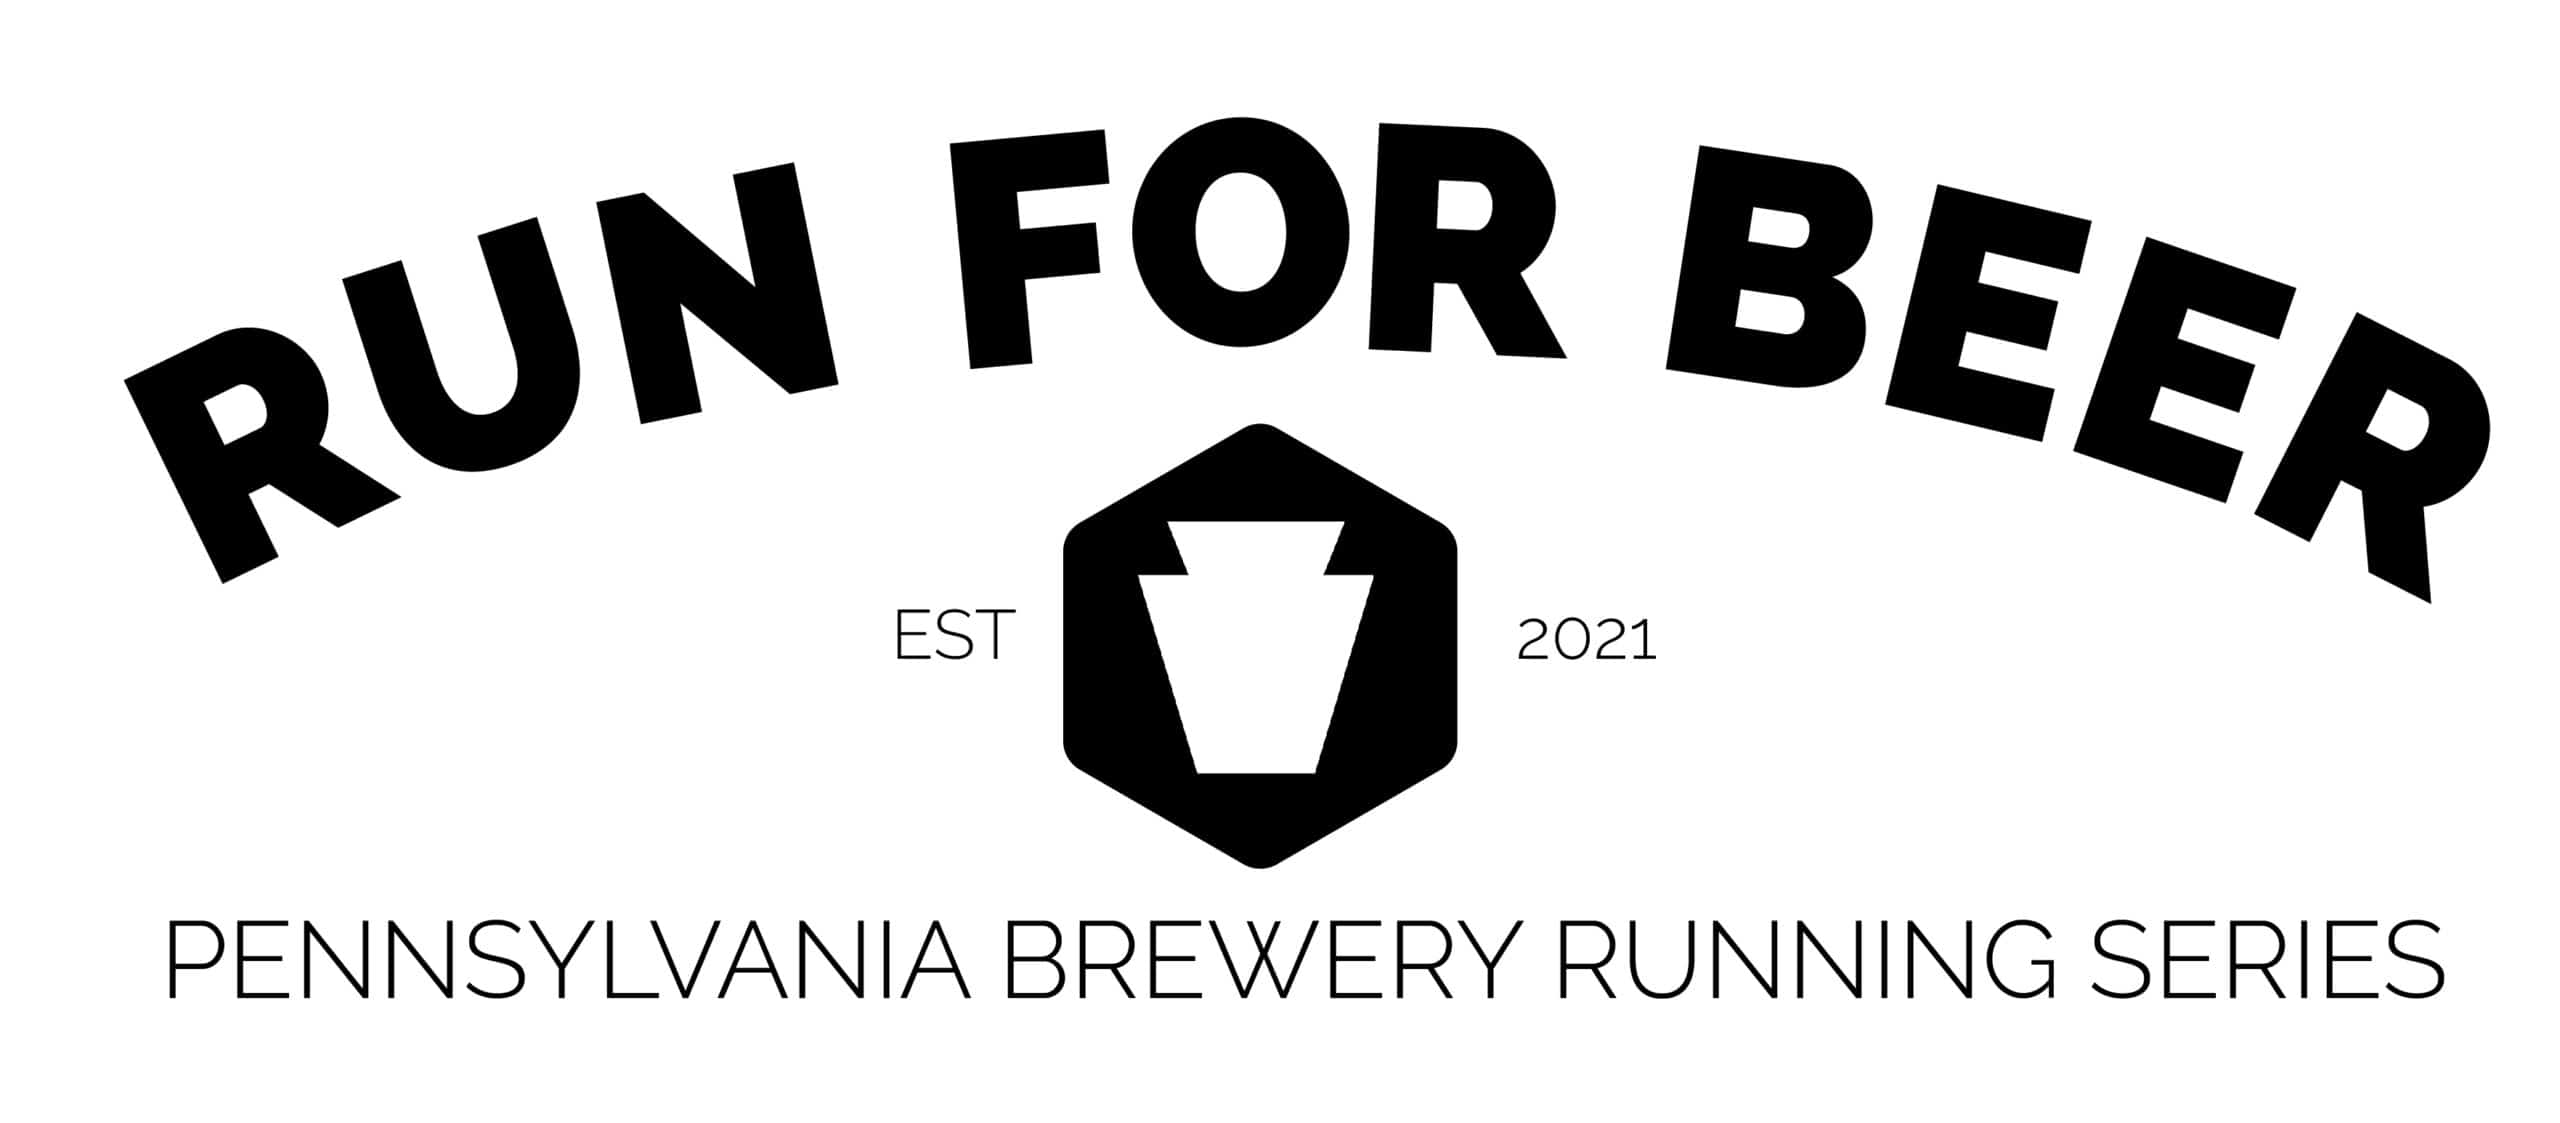 Pennsylvania Run for Beer